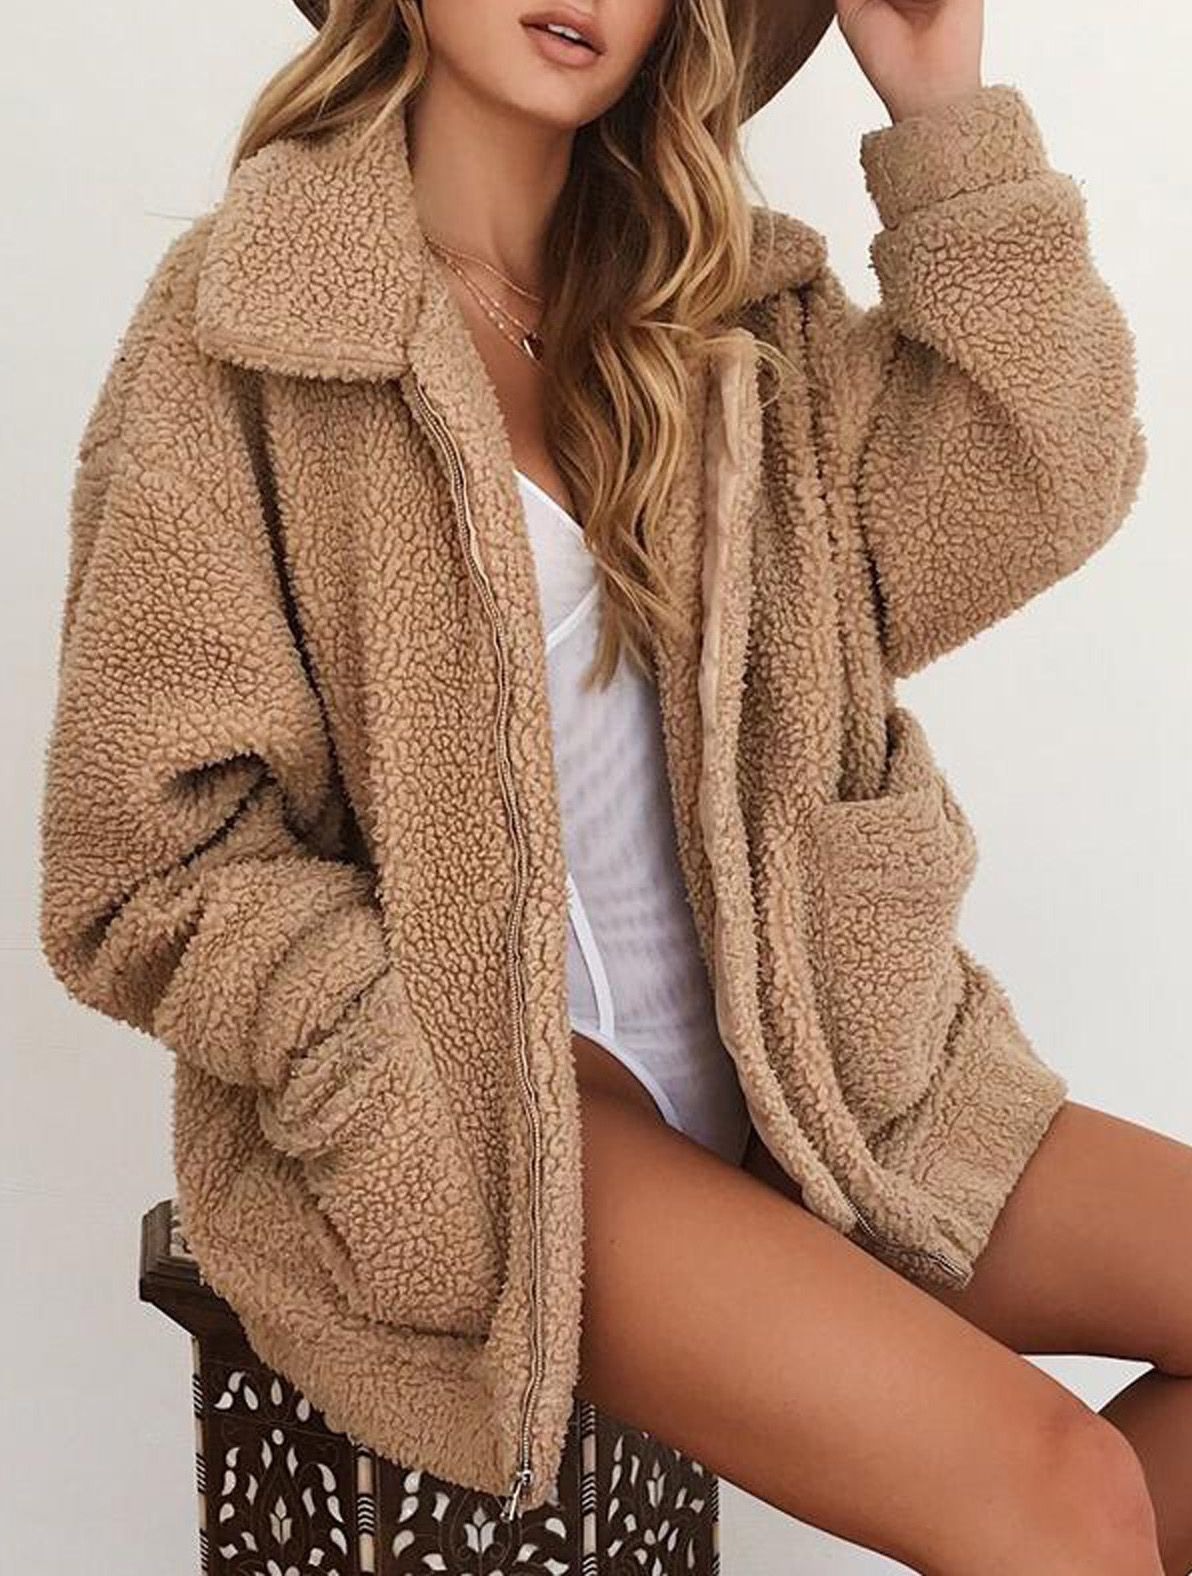 Aurora Popular Oversized Soft Comfy Sherpa Teddy Jacket Pixie Coat Coats Jackets Women Fashion Cool Outfits [ 1576 x 1192 Pixel ]